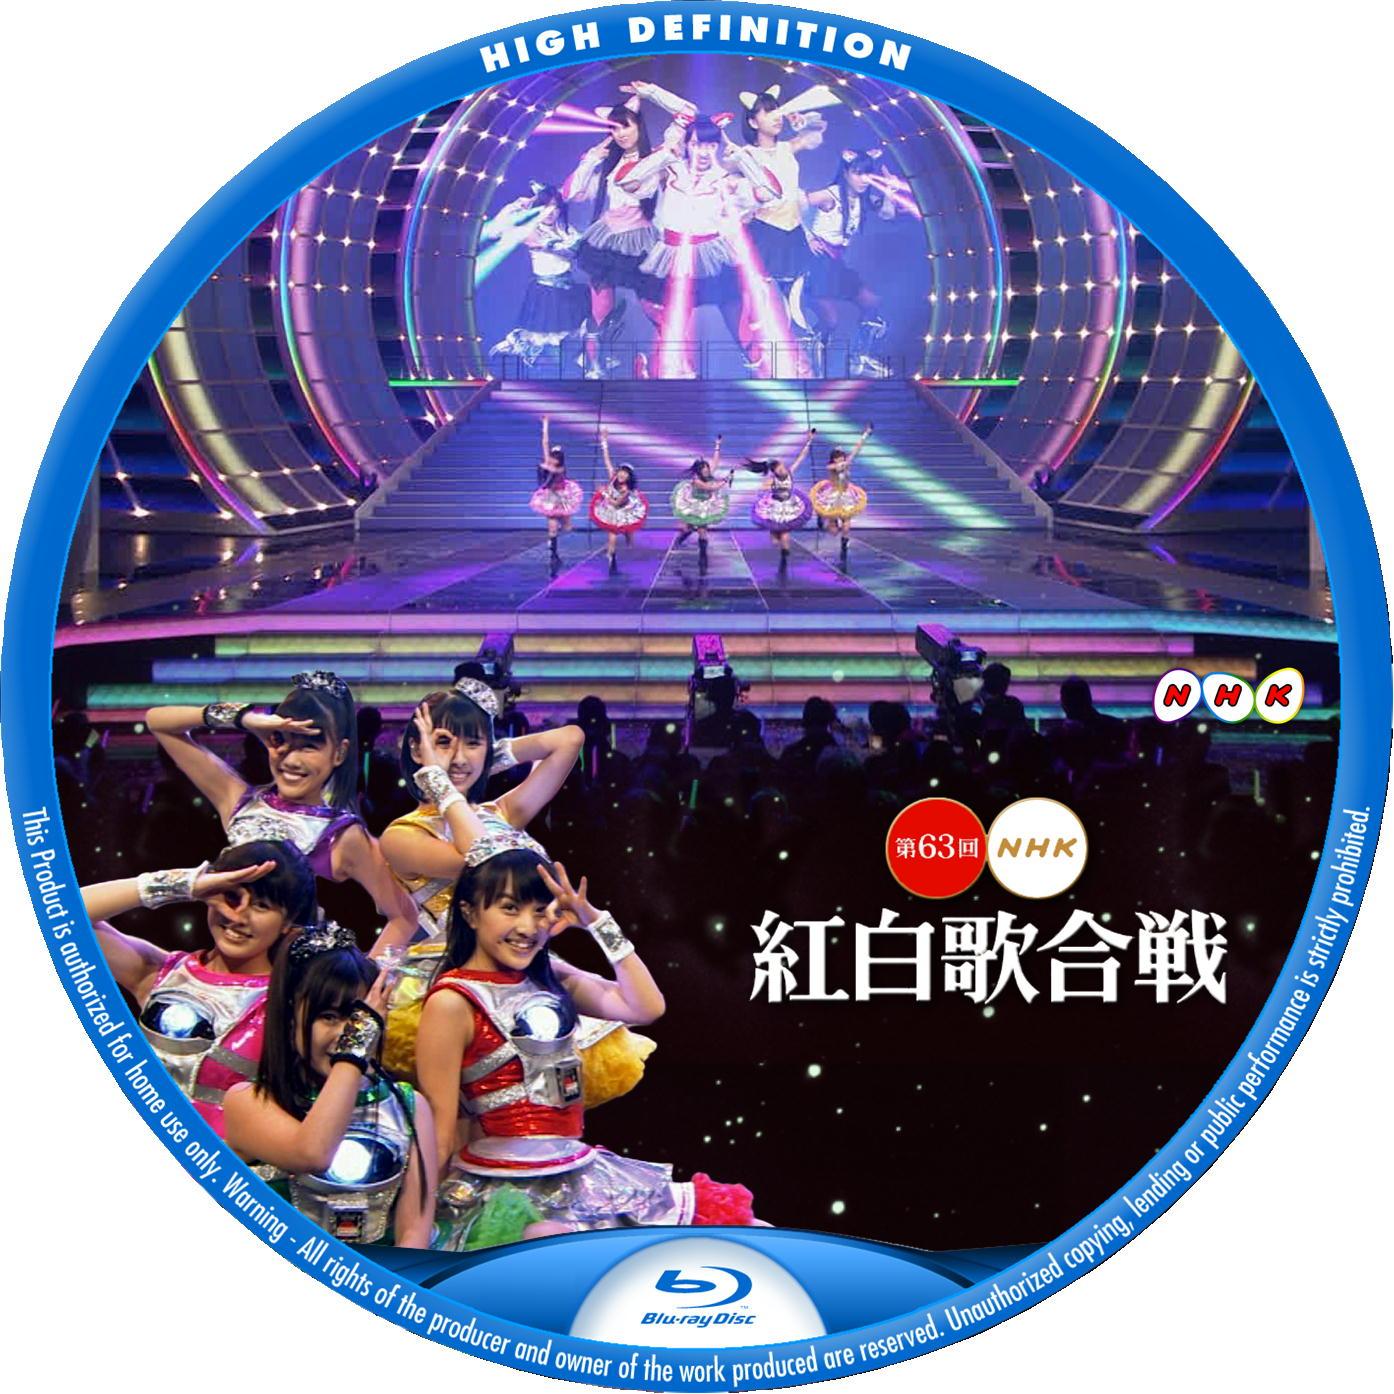 NHK紅白歌合戦 2012 ももクロ<br /> v2 BDラベル